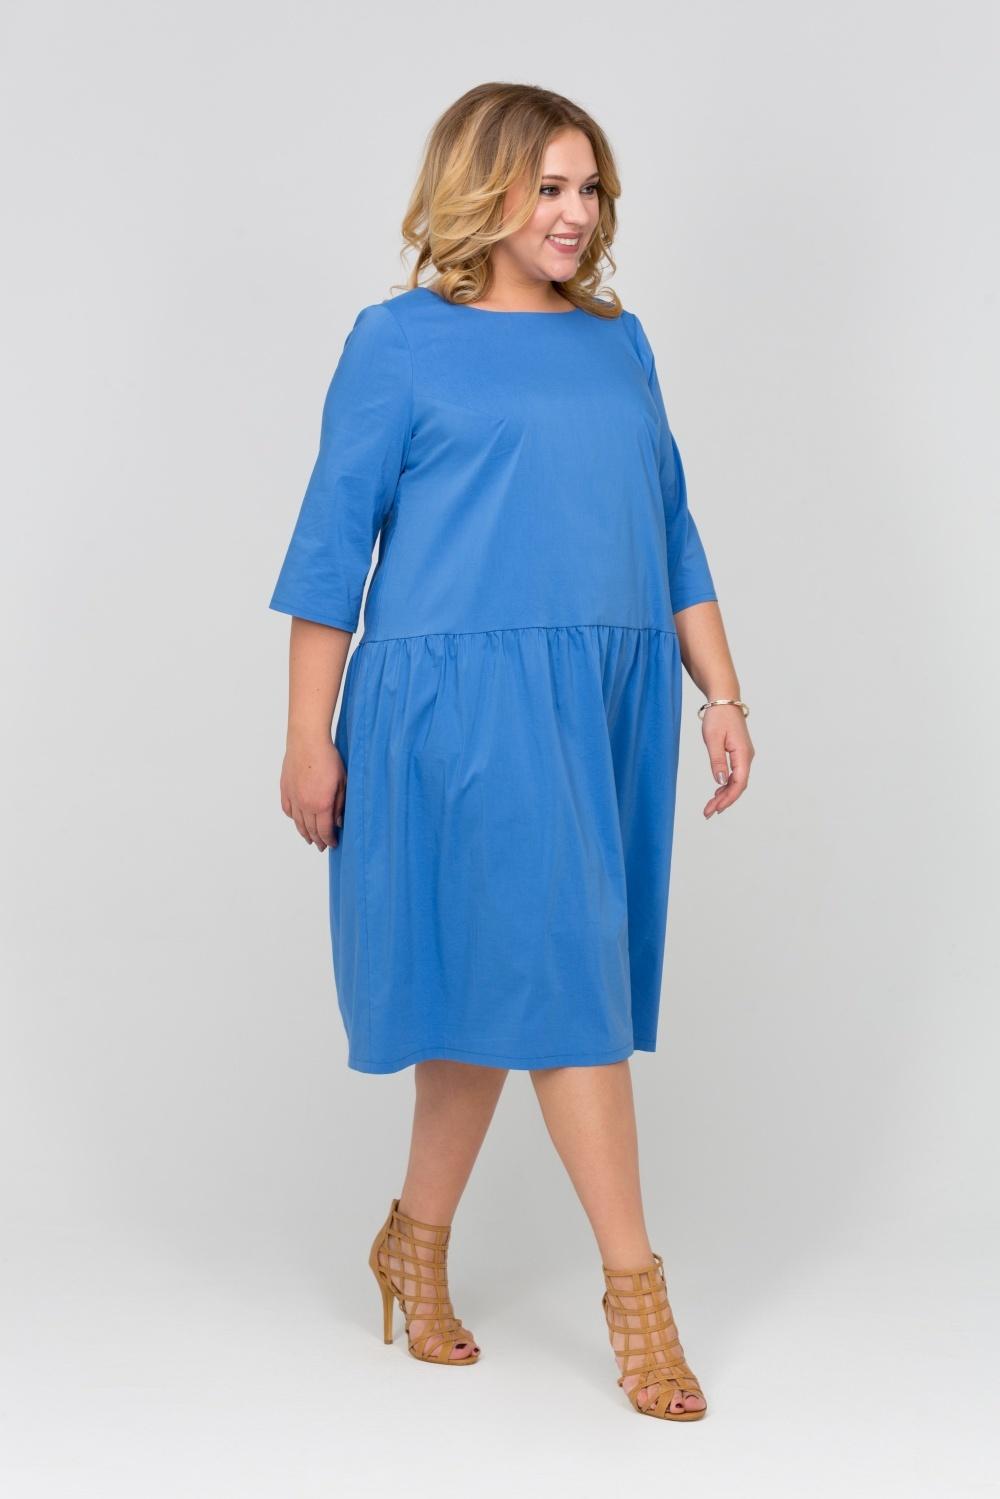 Платья Платье Лоли голубое 6aafdd697ddd03225065461b6aba38a9.jpg